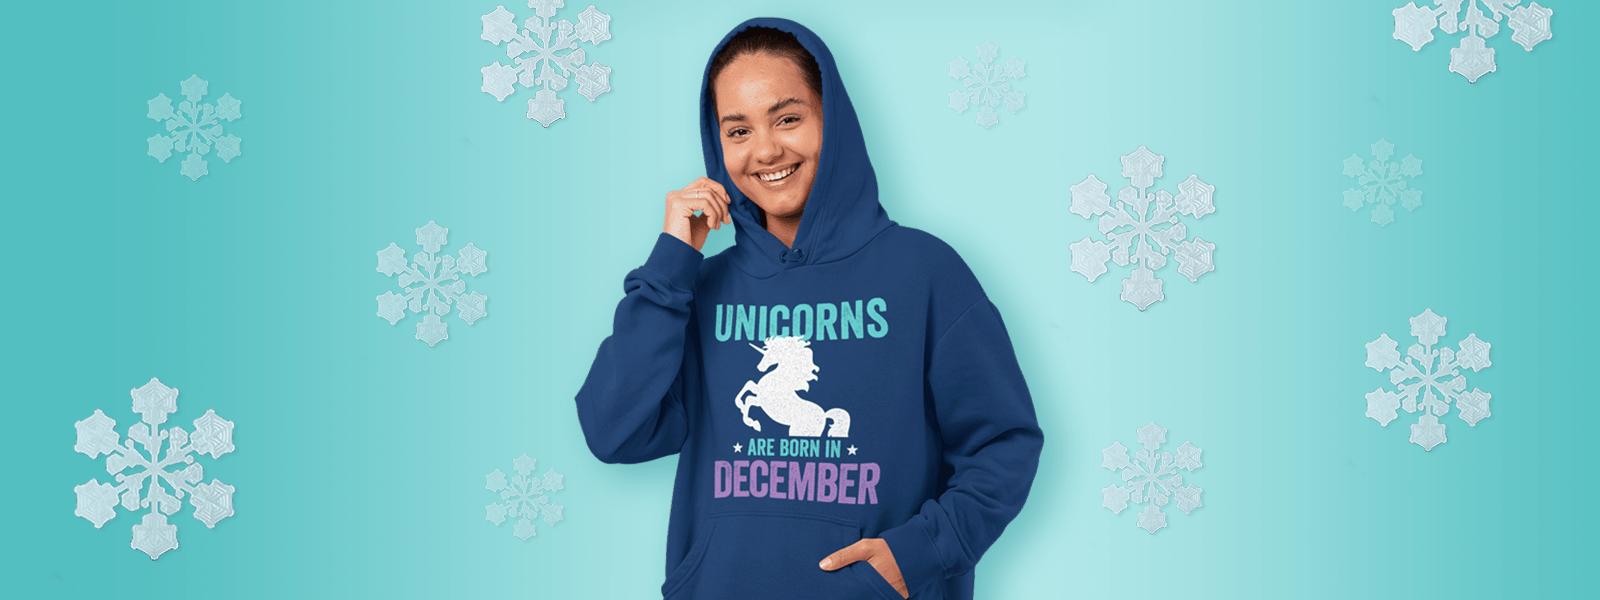 The Best December Birthday Gifts